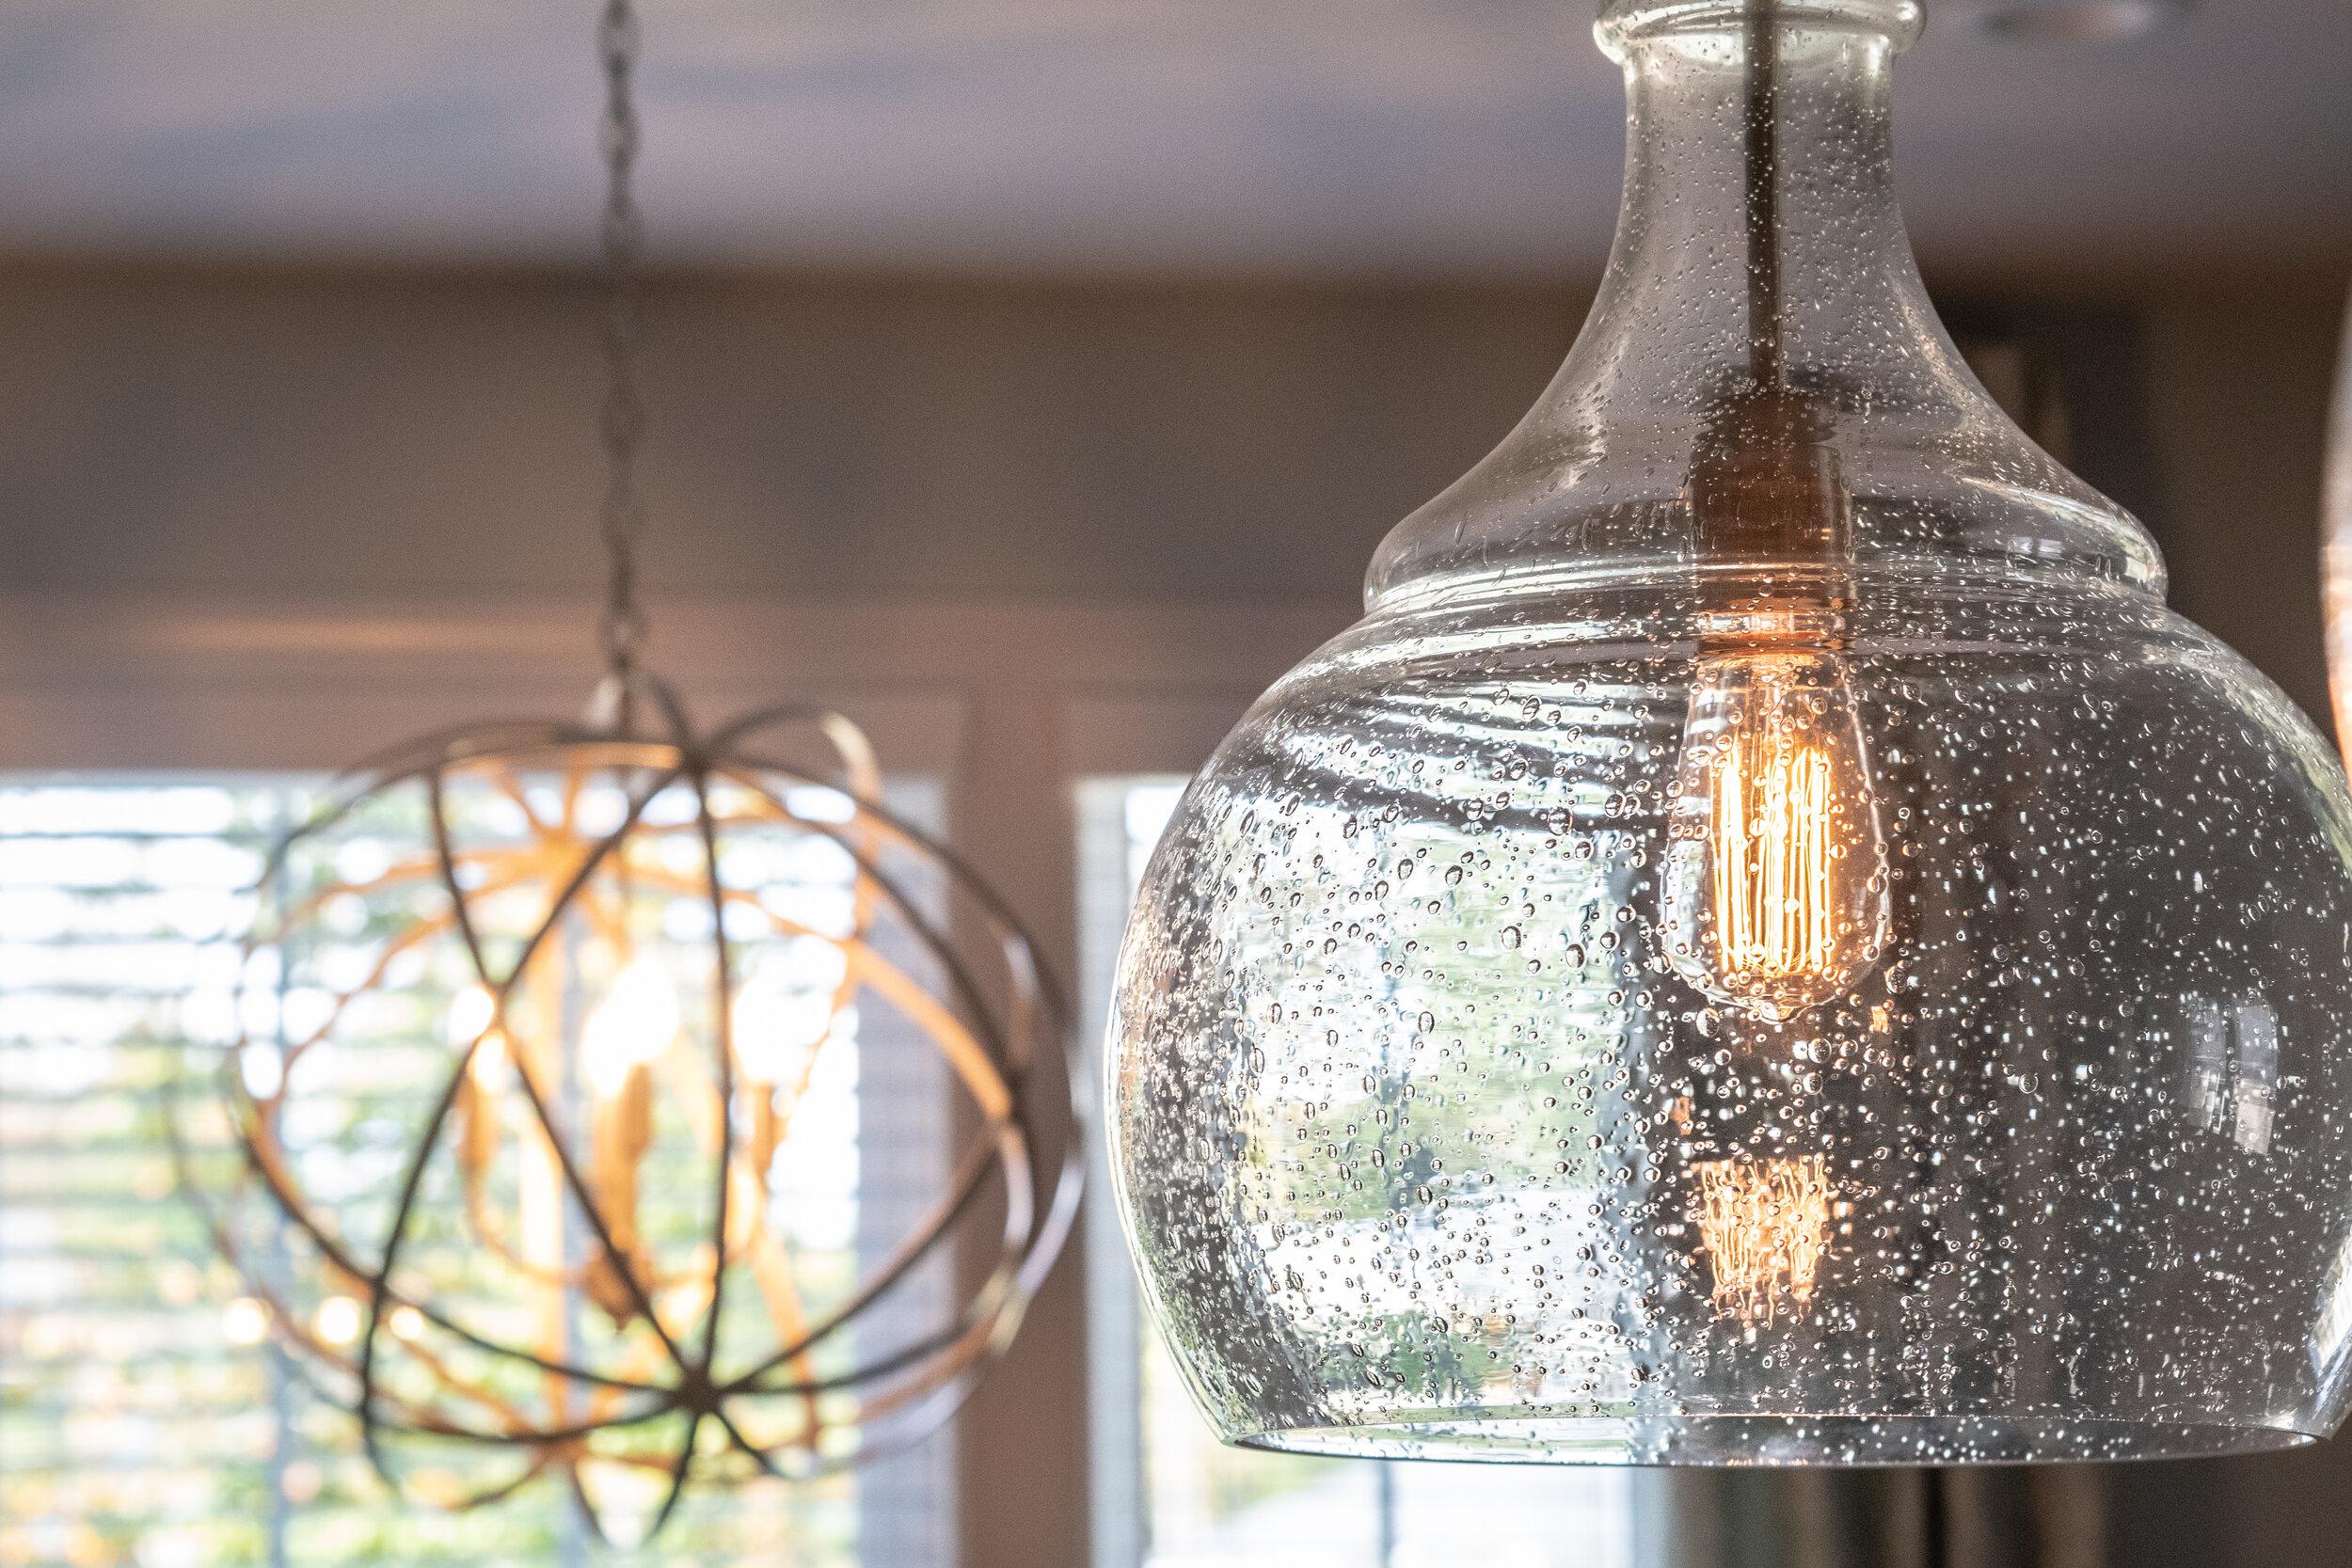 First Impressions oversize light fixture